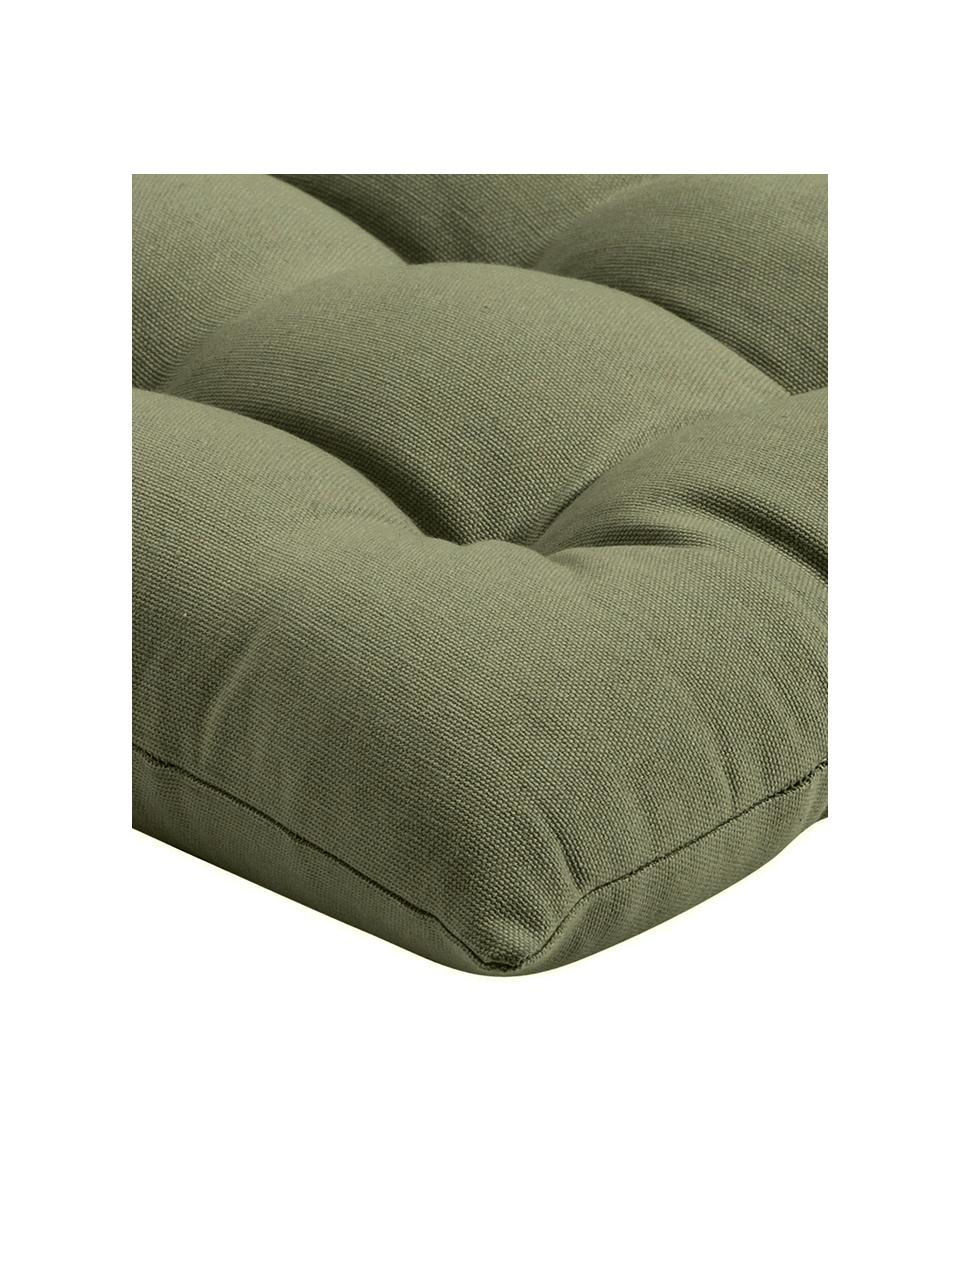 Sitzkissen Ava in Olivgrün, Bezug: 100% Baumwolle, Grün, 40 x 40 cm